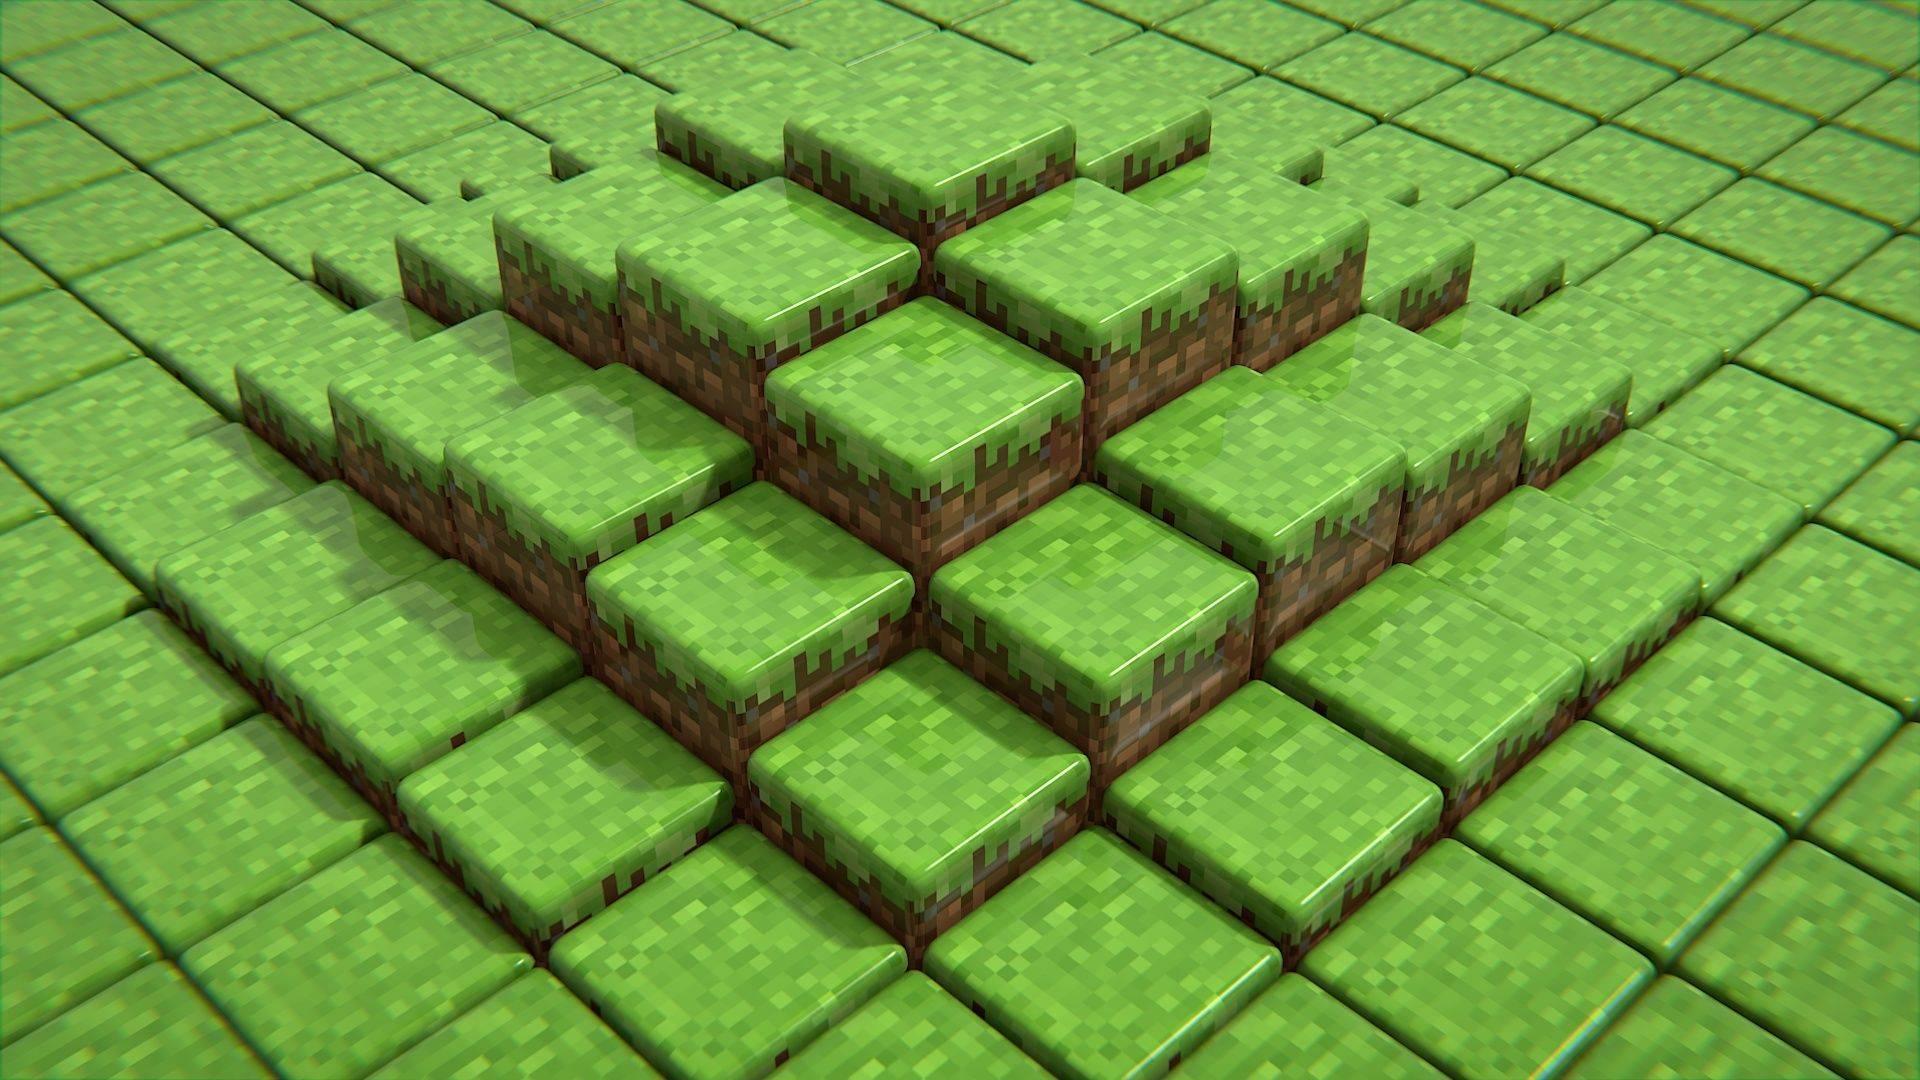 Minecraft: Green Hill #24095 / Good